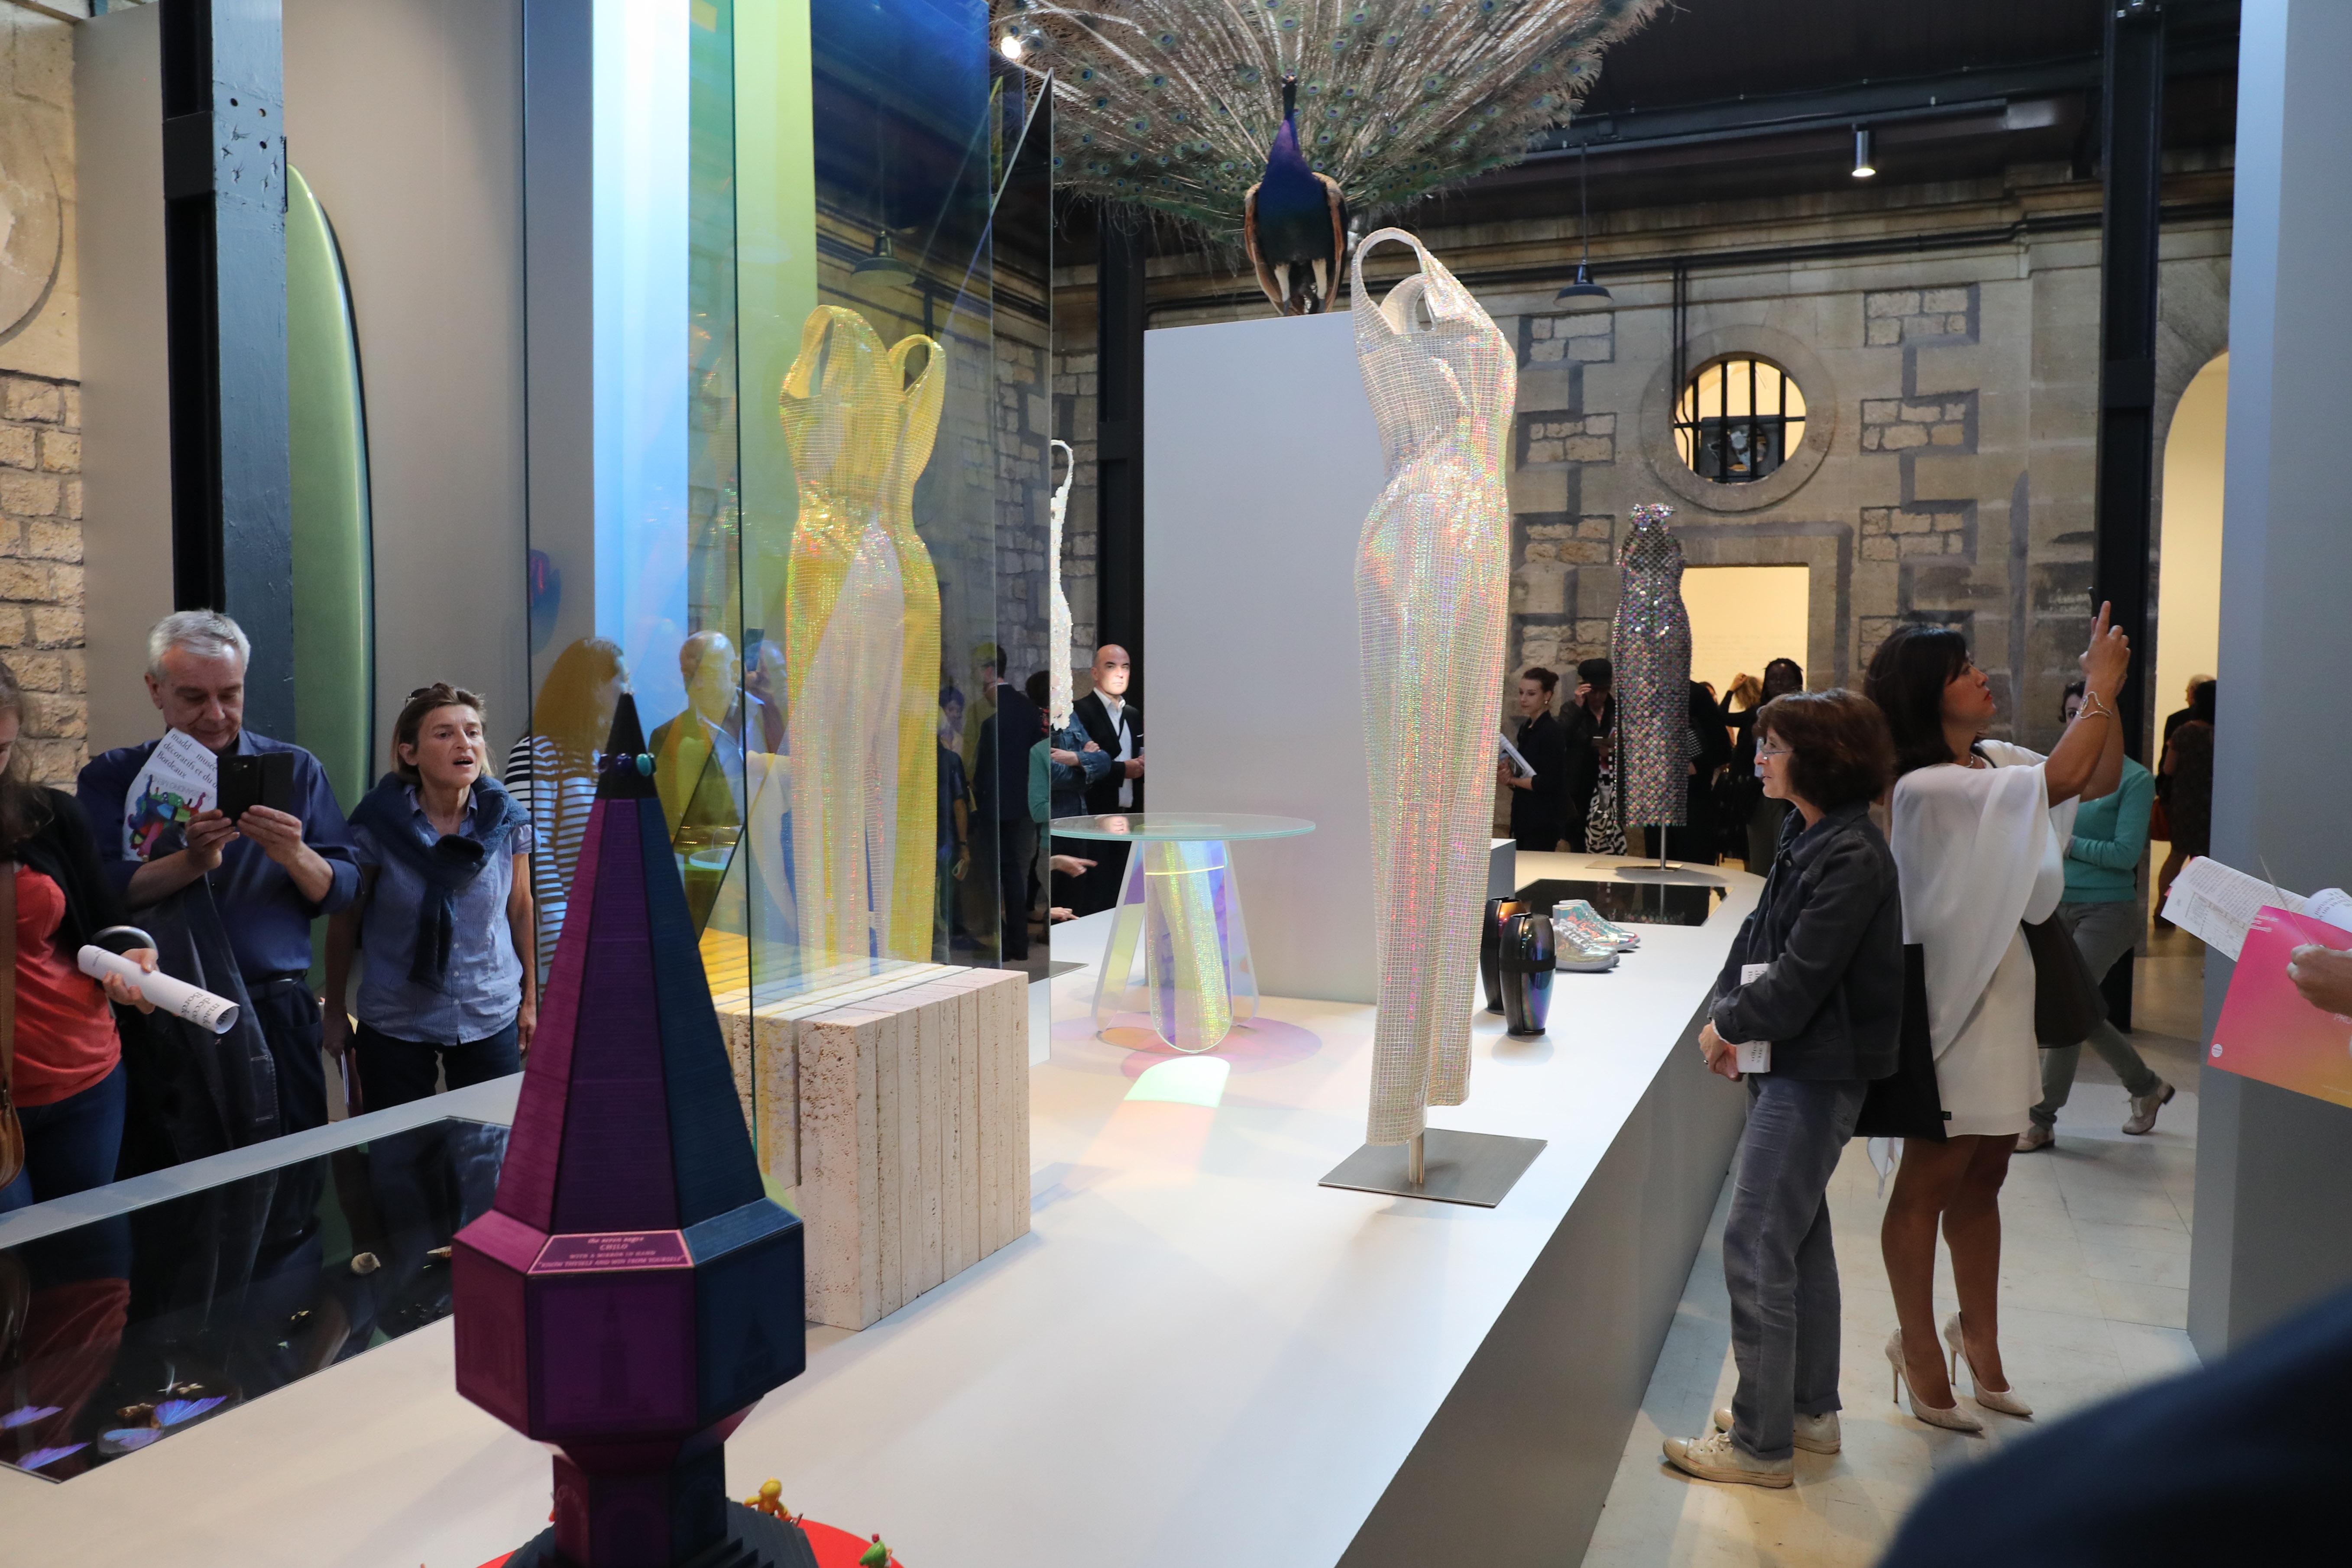 saison culturelle paysage musée art decoratif design robert